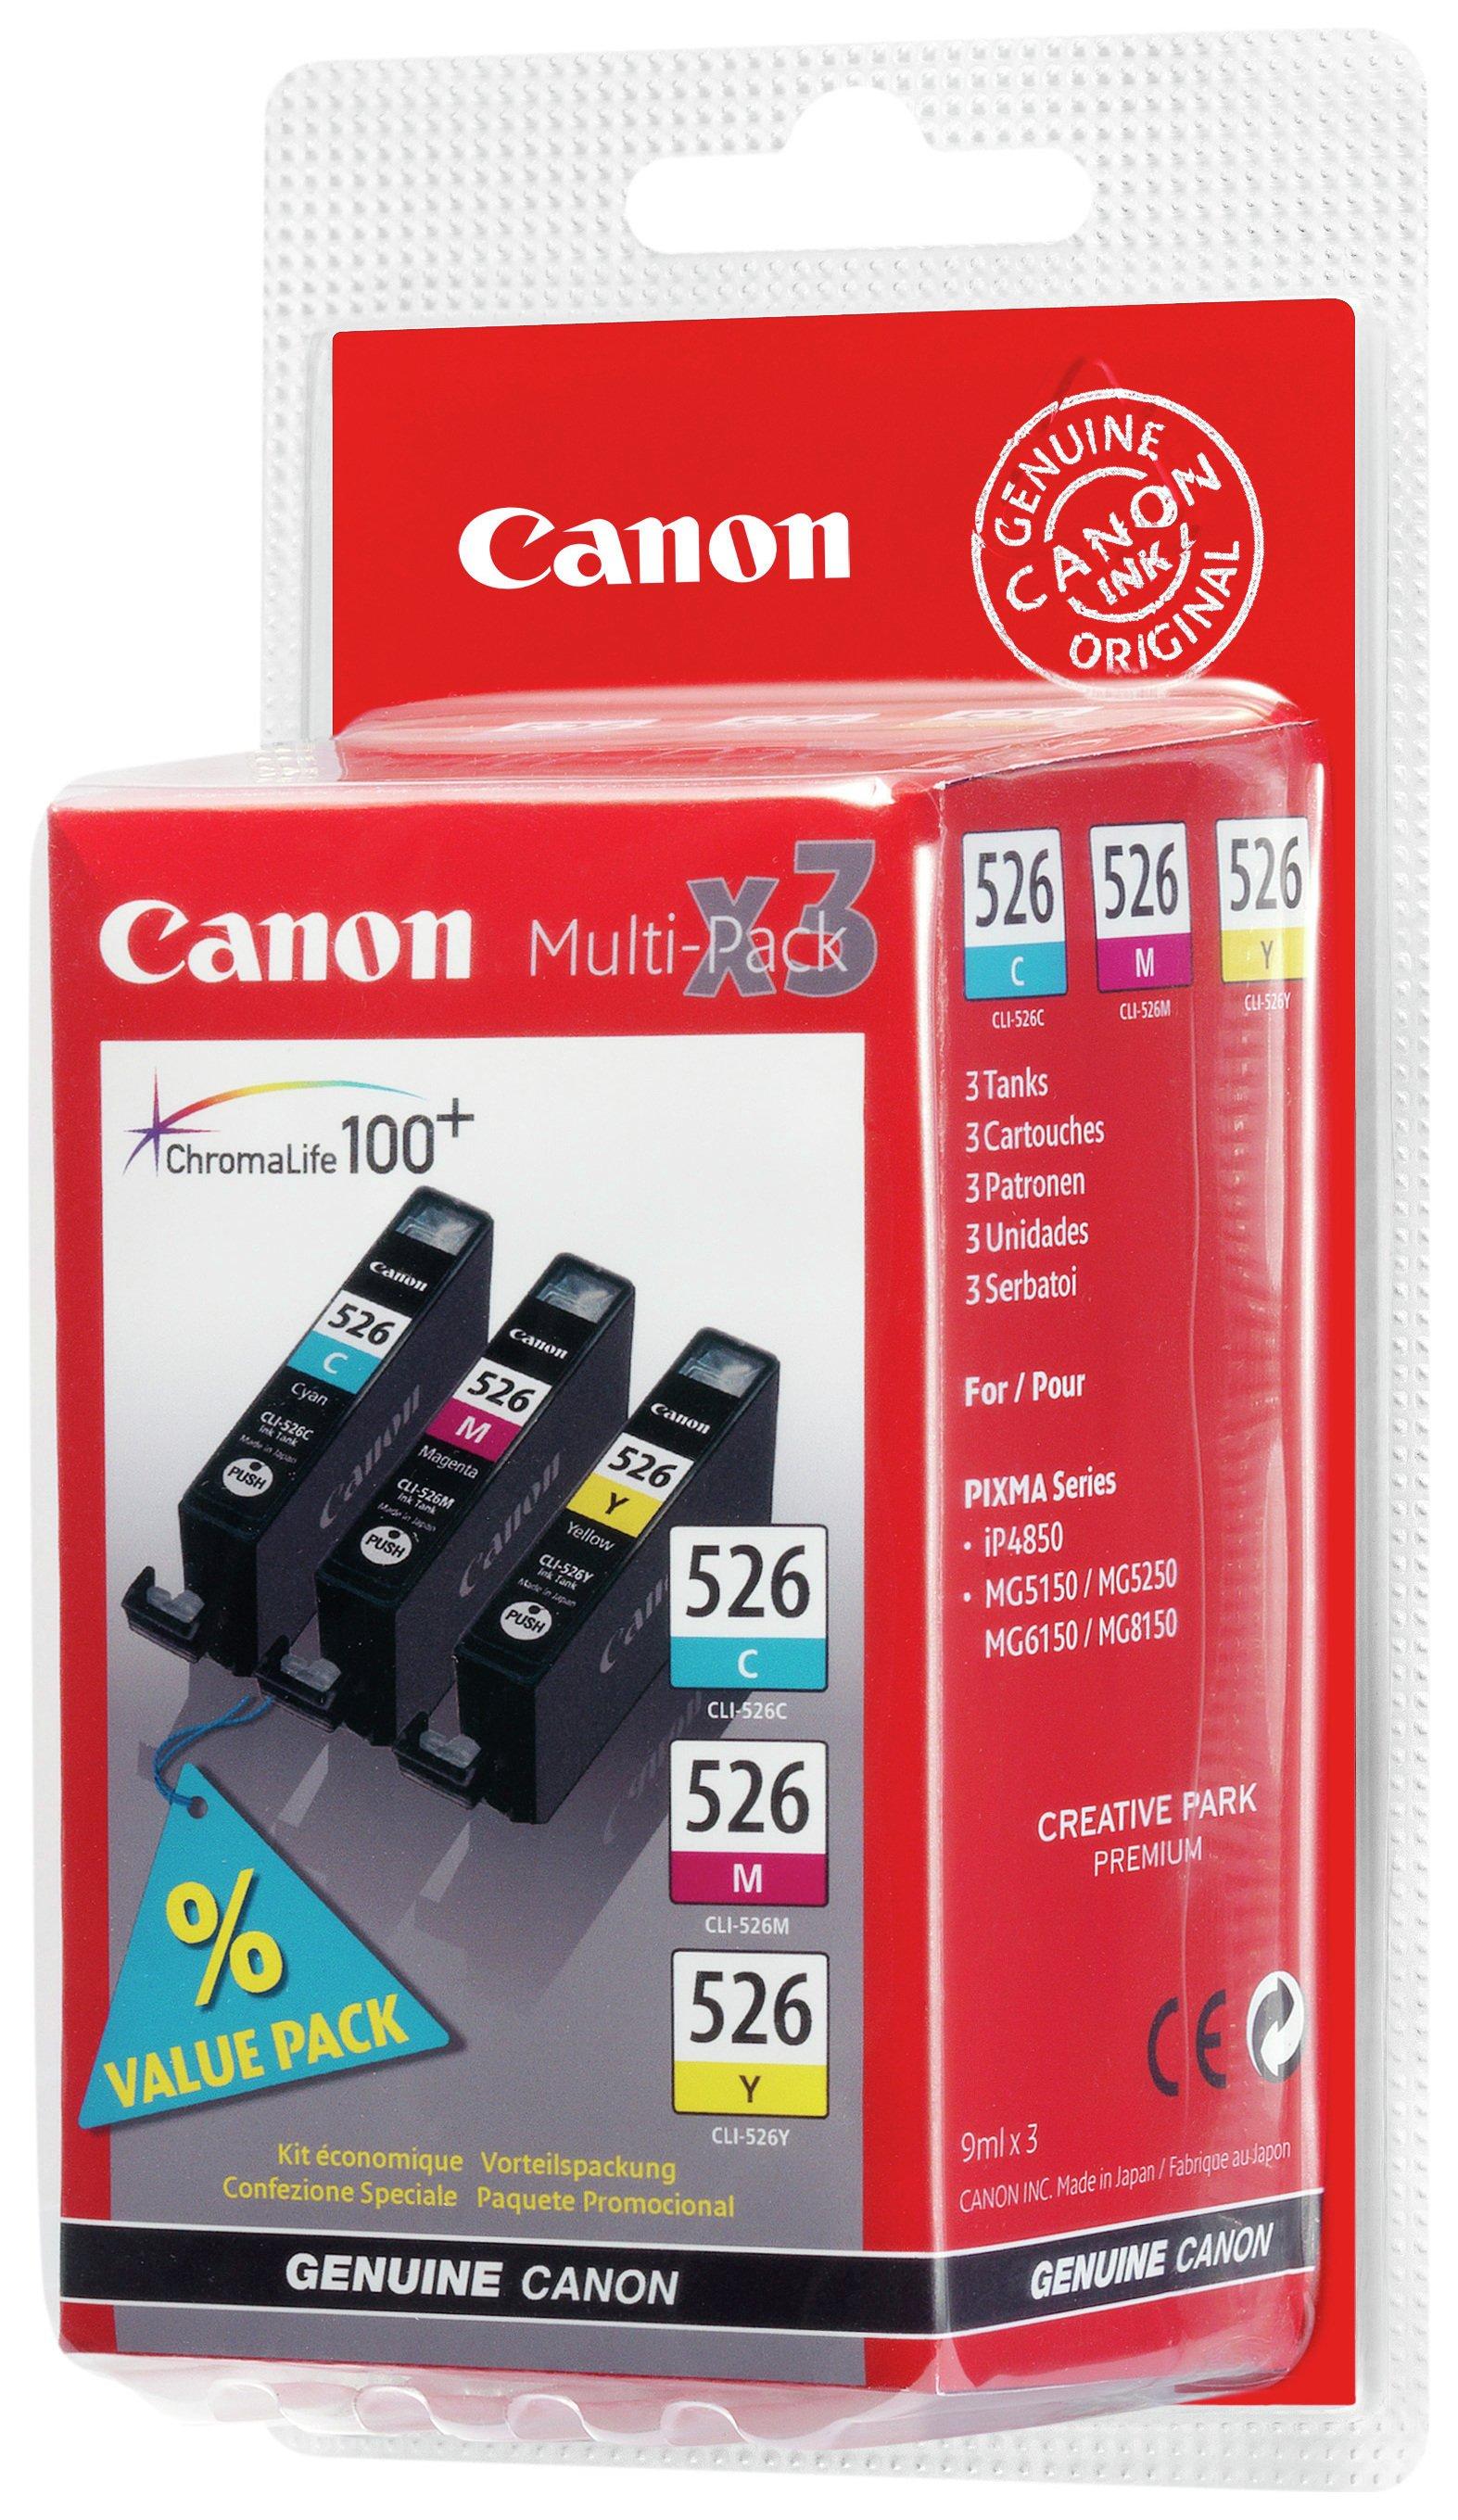 Canon Canon CLI-526 Ink Cartridge Multi-pack.